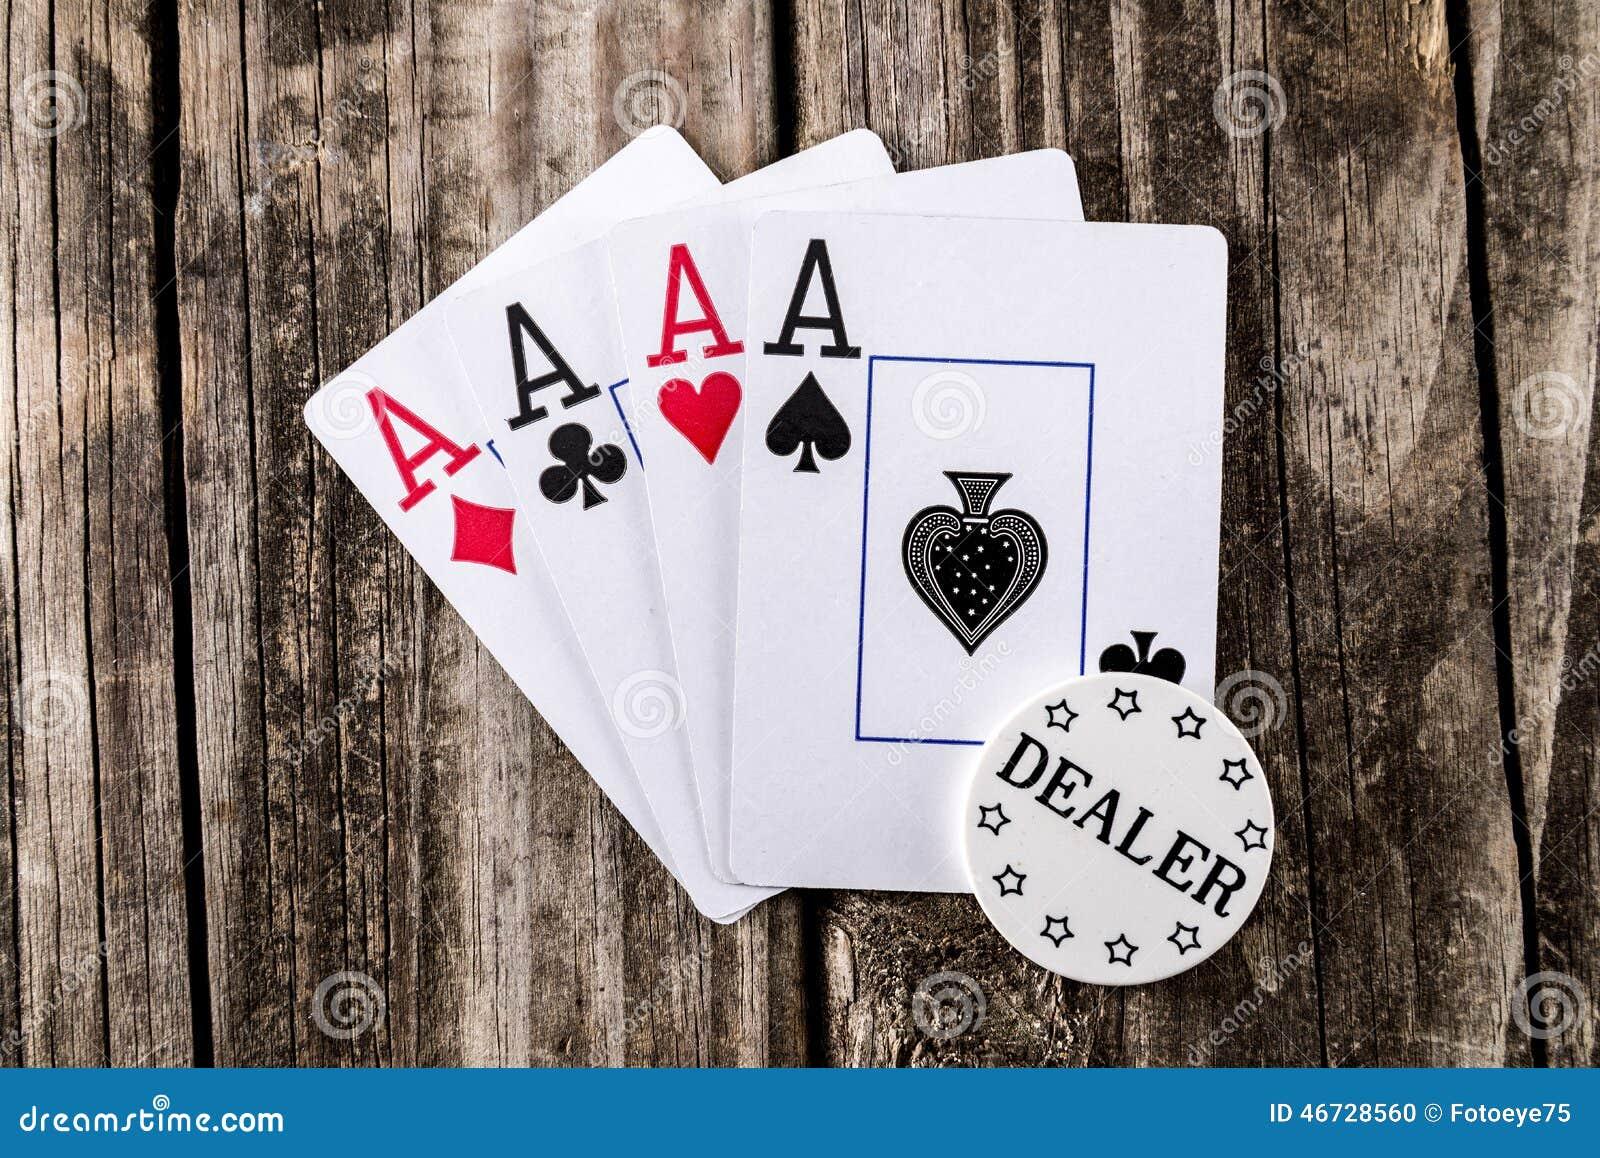 casino online poker 4 of a kind